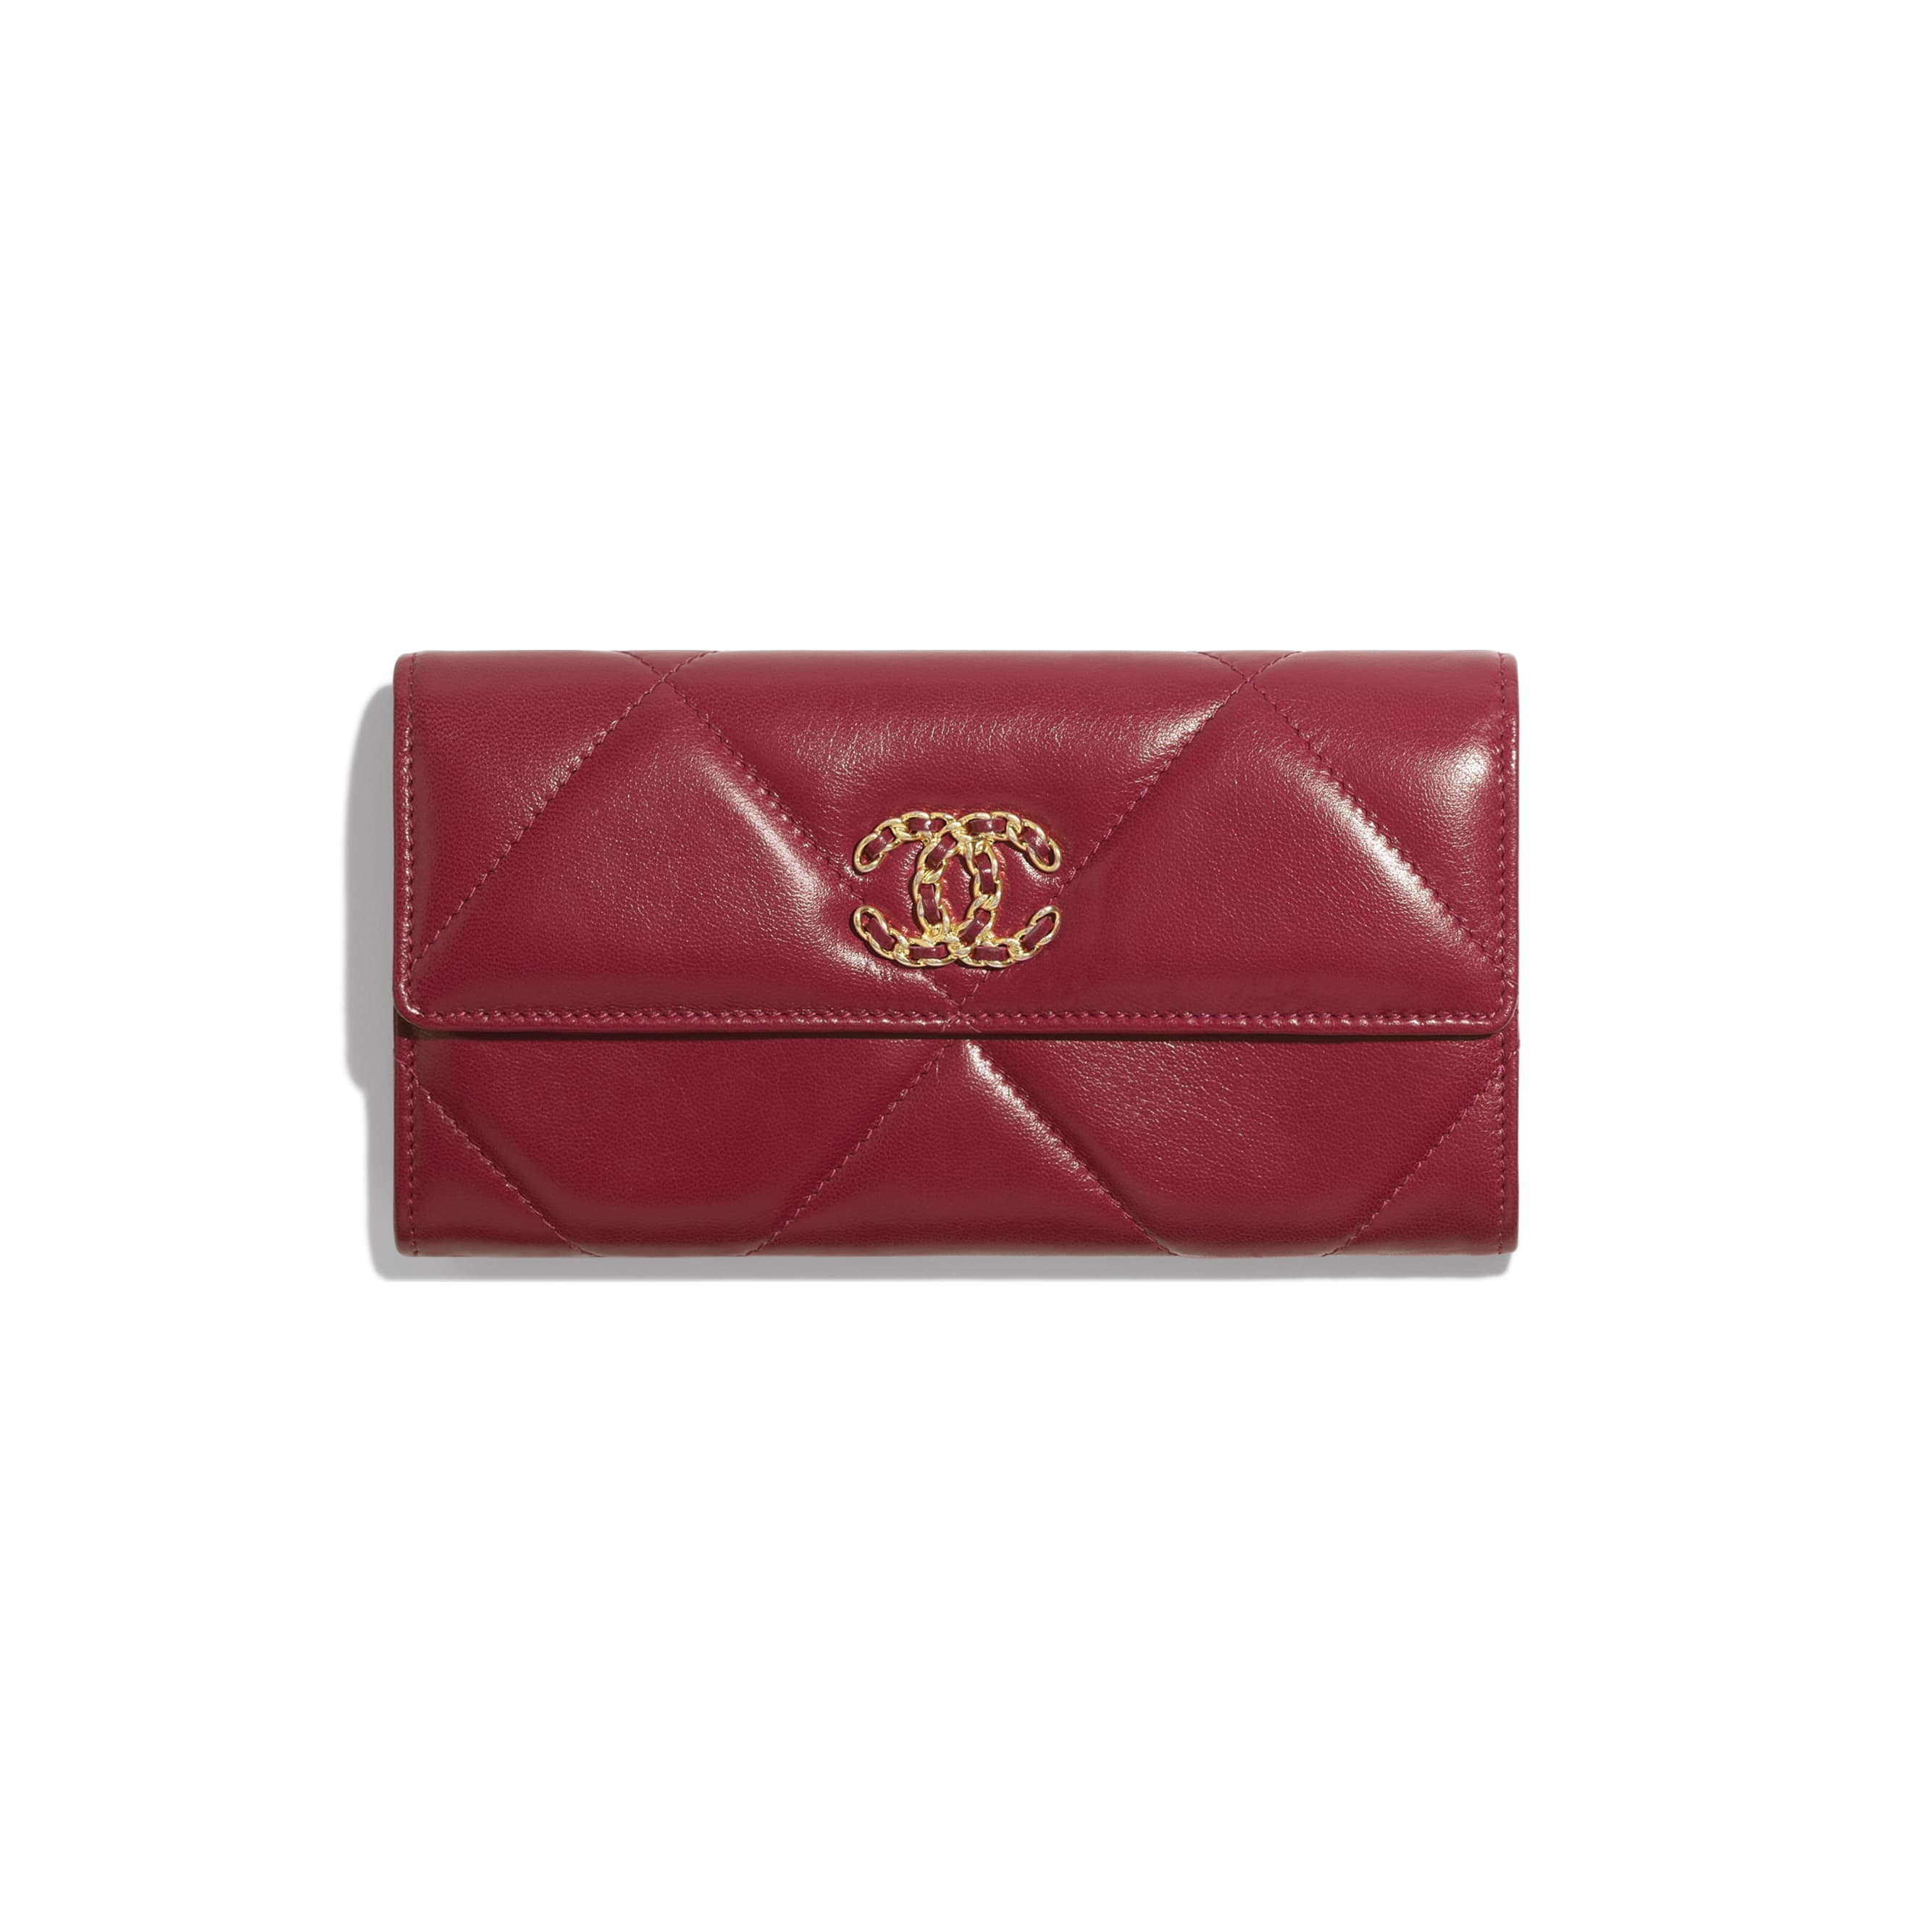 CHANEL 19 Long Flap Wallet - Dark Pink - Goatskin, Gold-Tone, Silver-Tone & Ruthenium-Finish Metal - Default view - see standard sized version